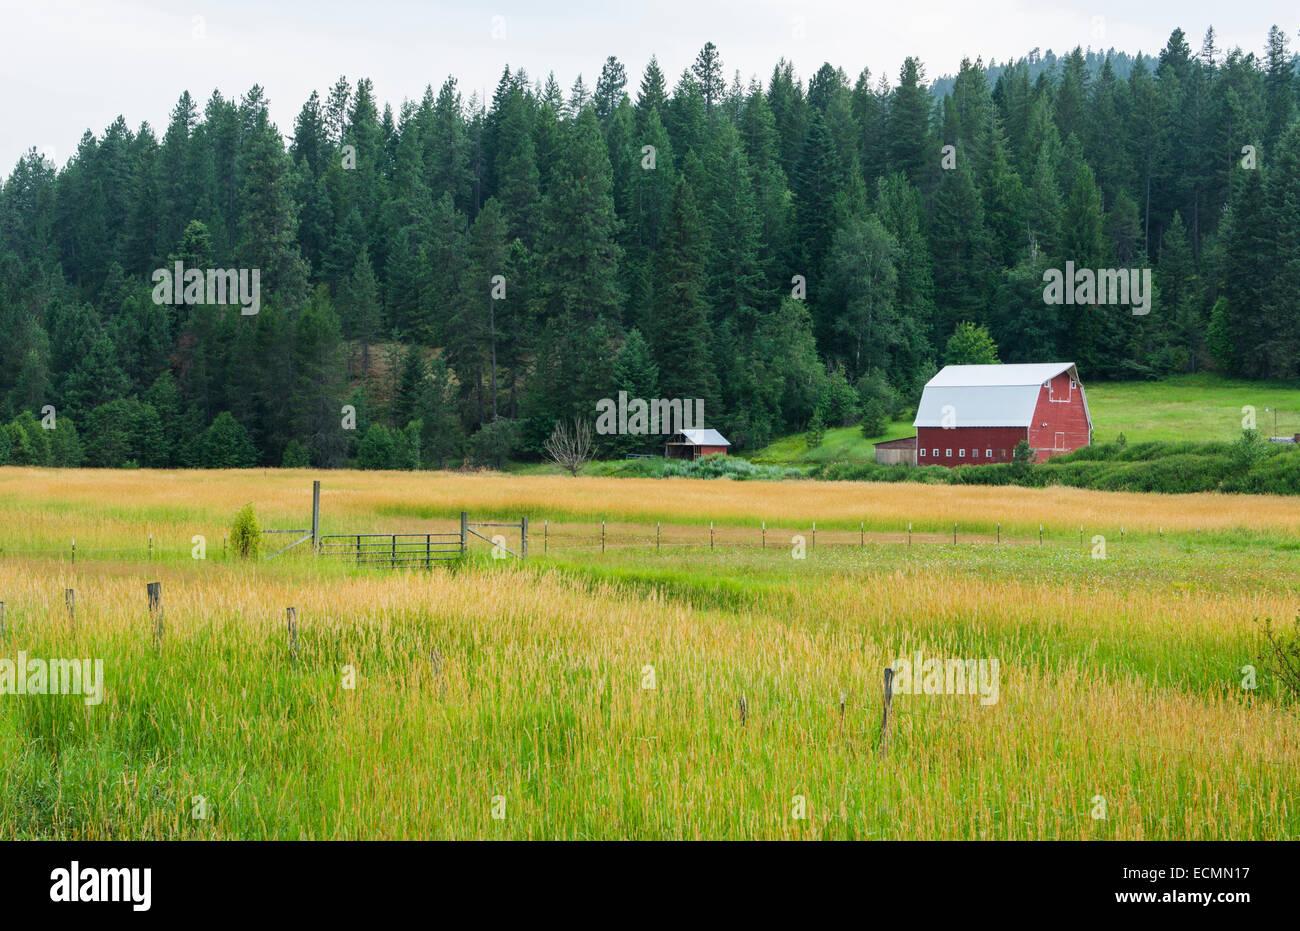 Coeur d' Alene Idaho farm with red barn in peaceful setting of farming - Stock Image